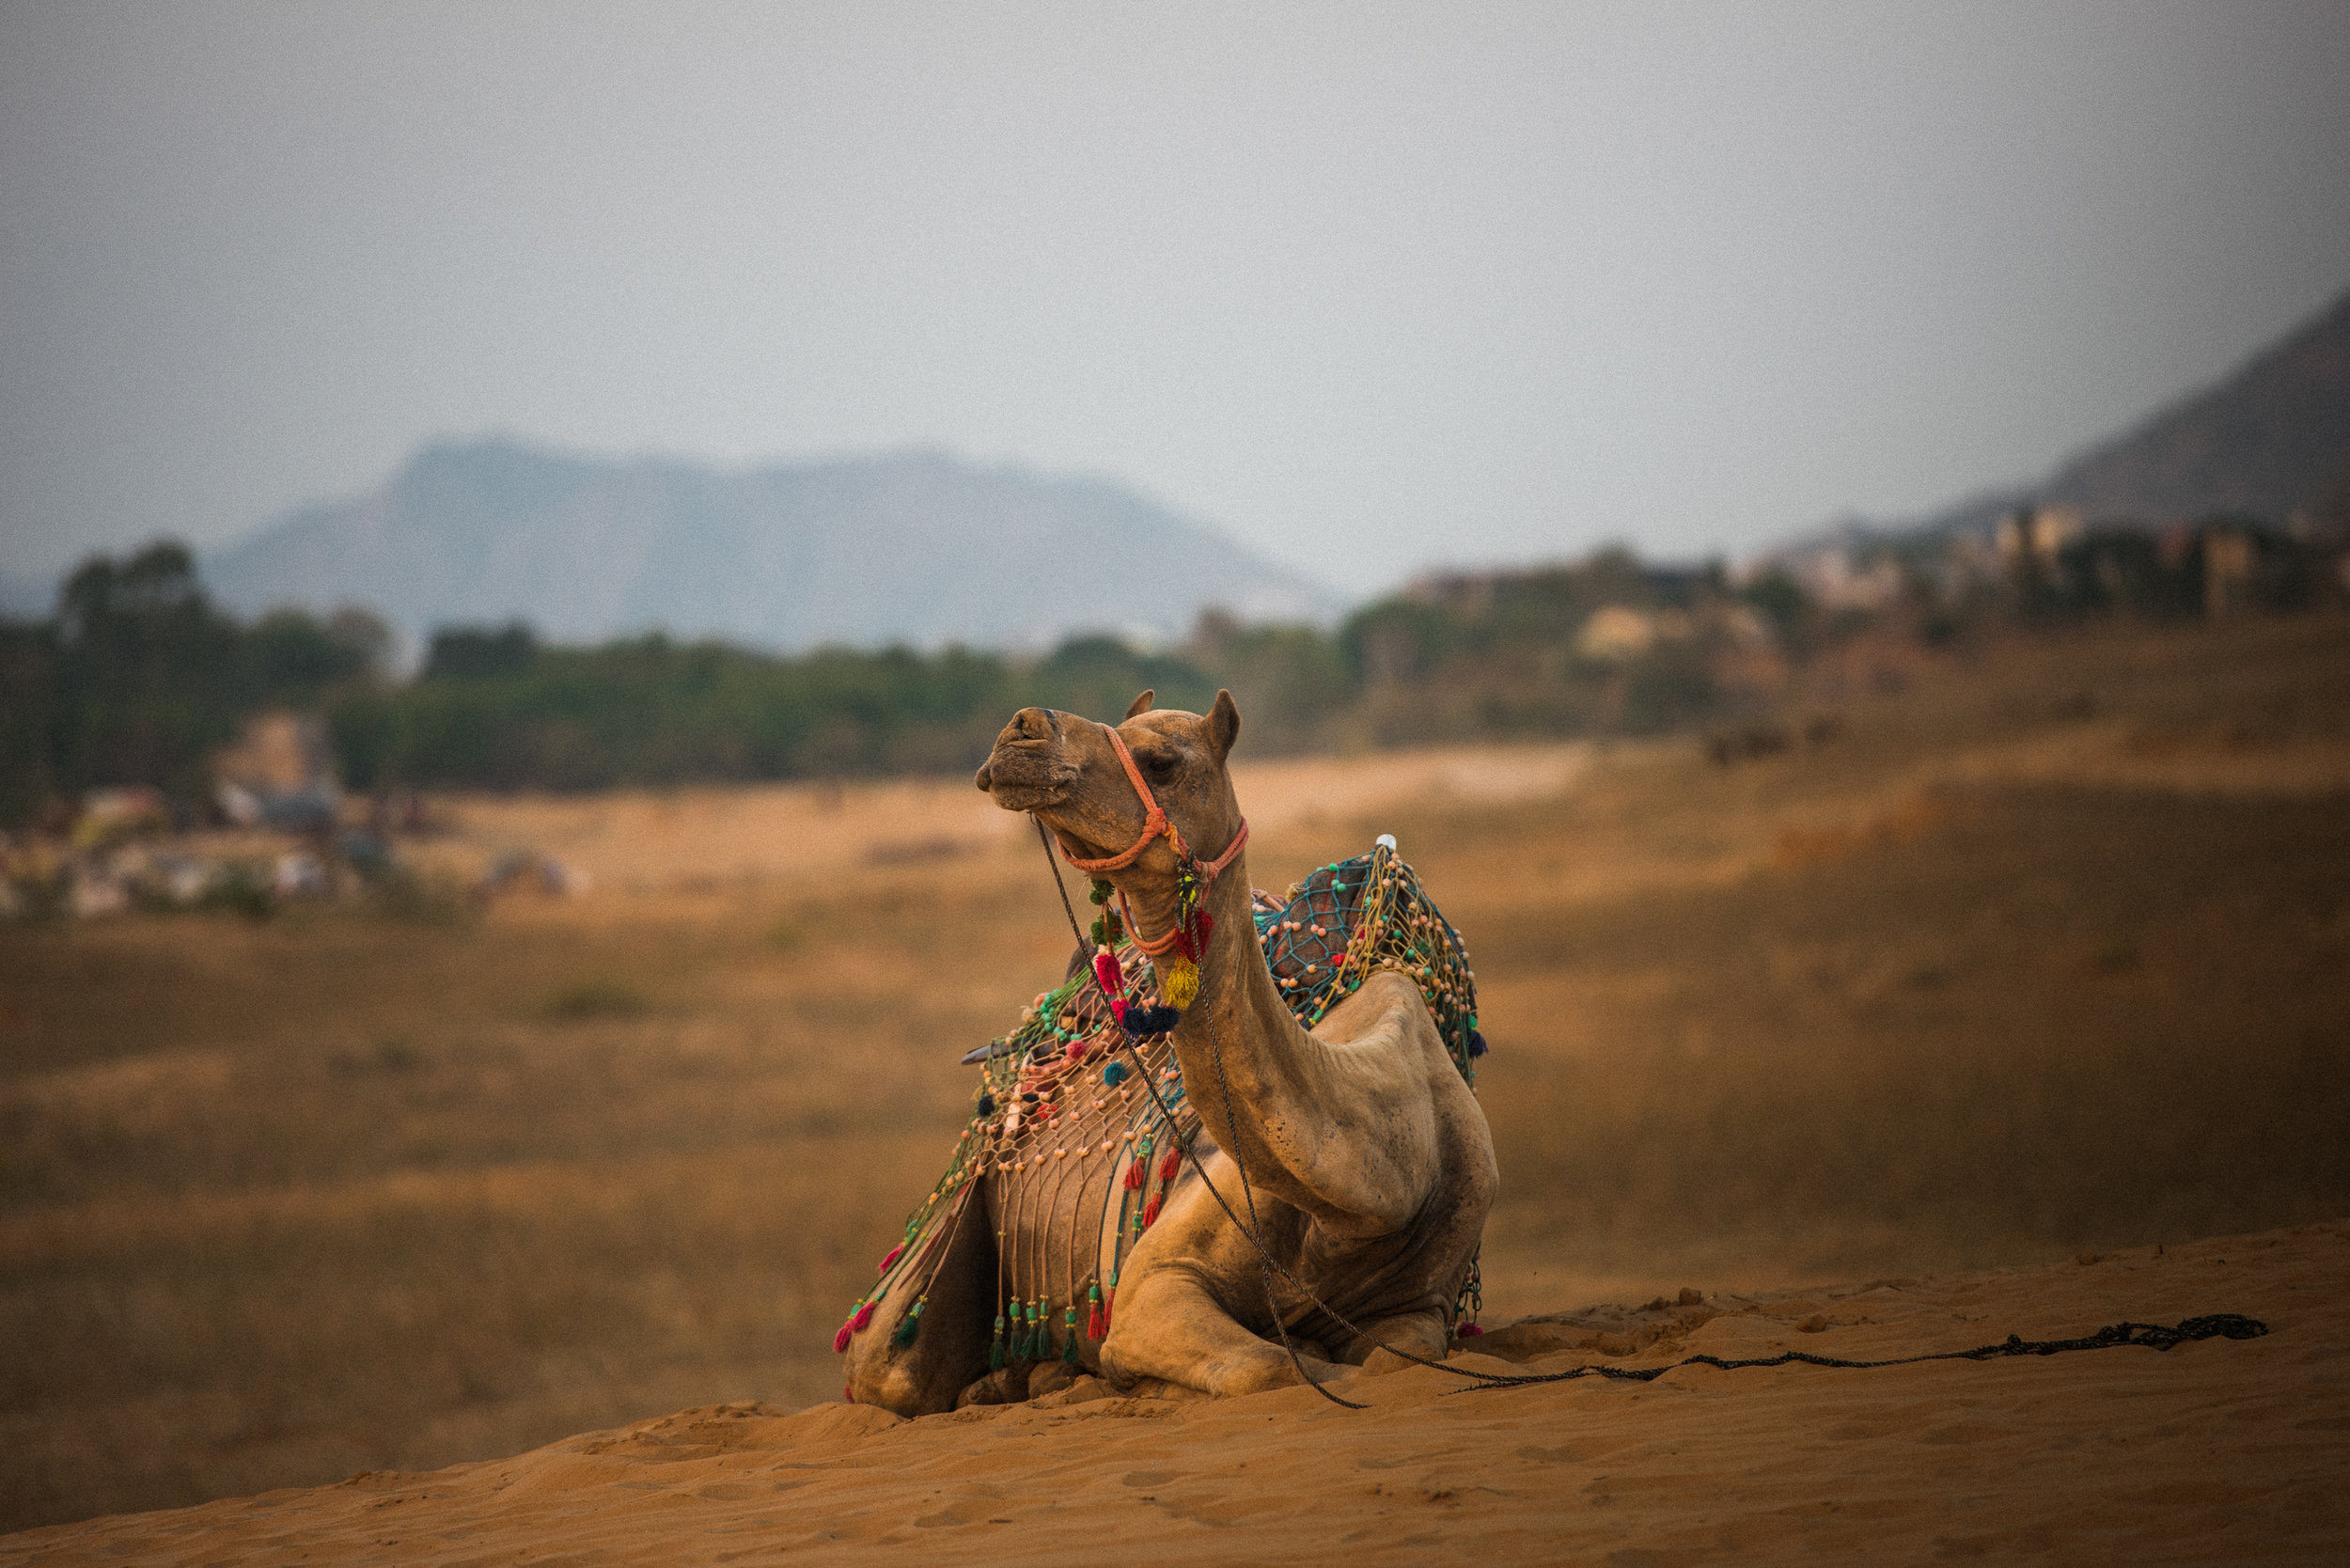 Pushkar_India_TaraShupe_Photography_073.jpg